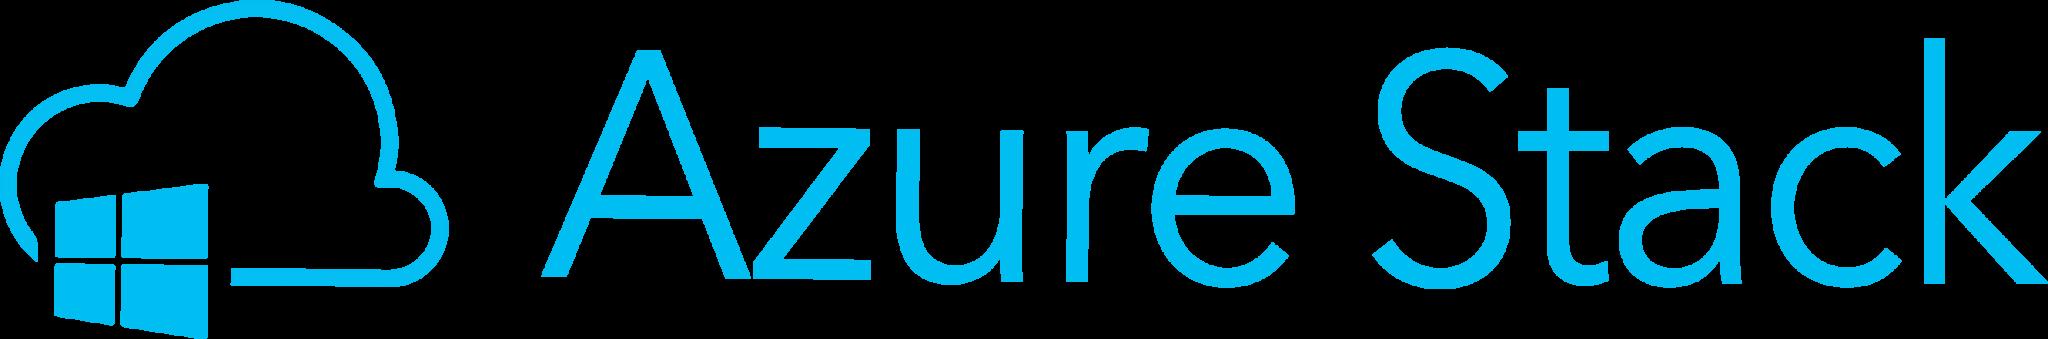 Microsoft Azure Stack